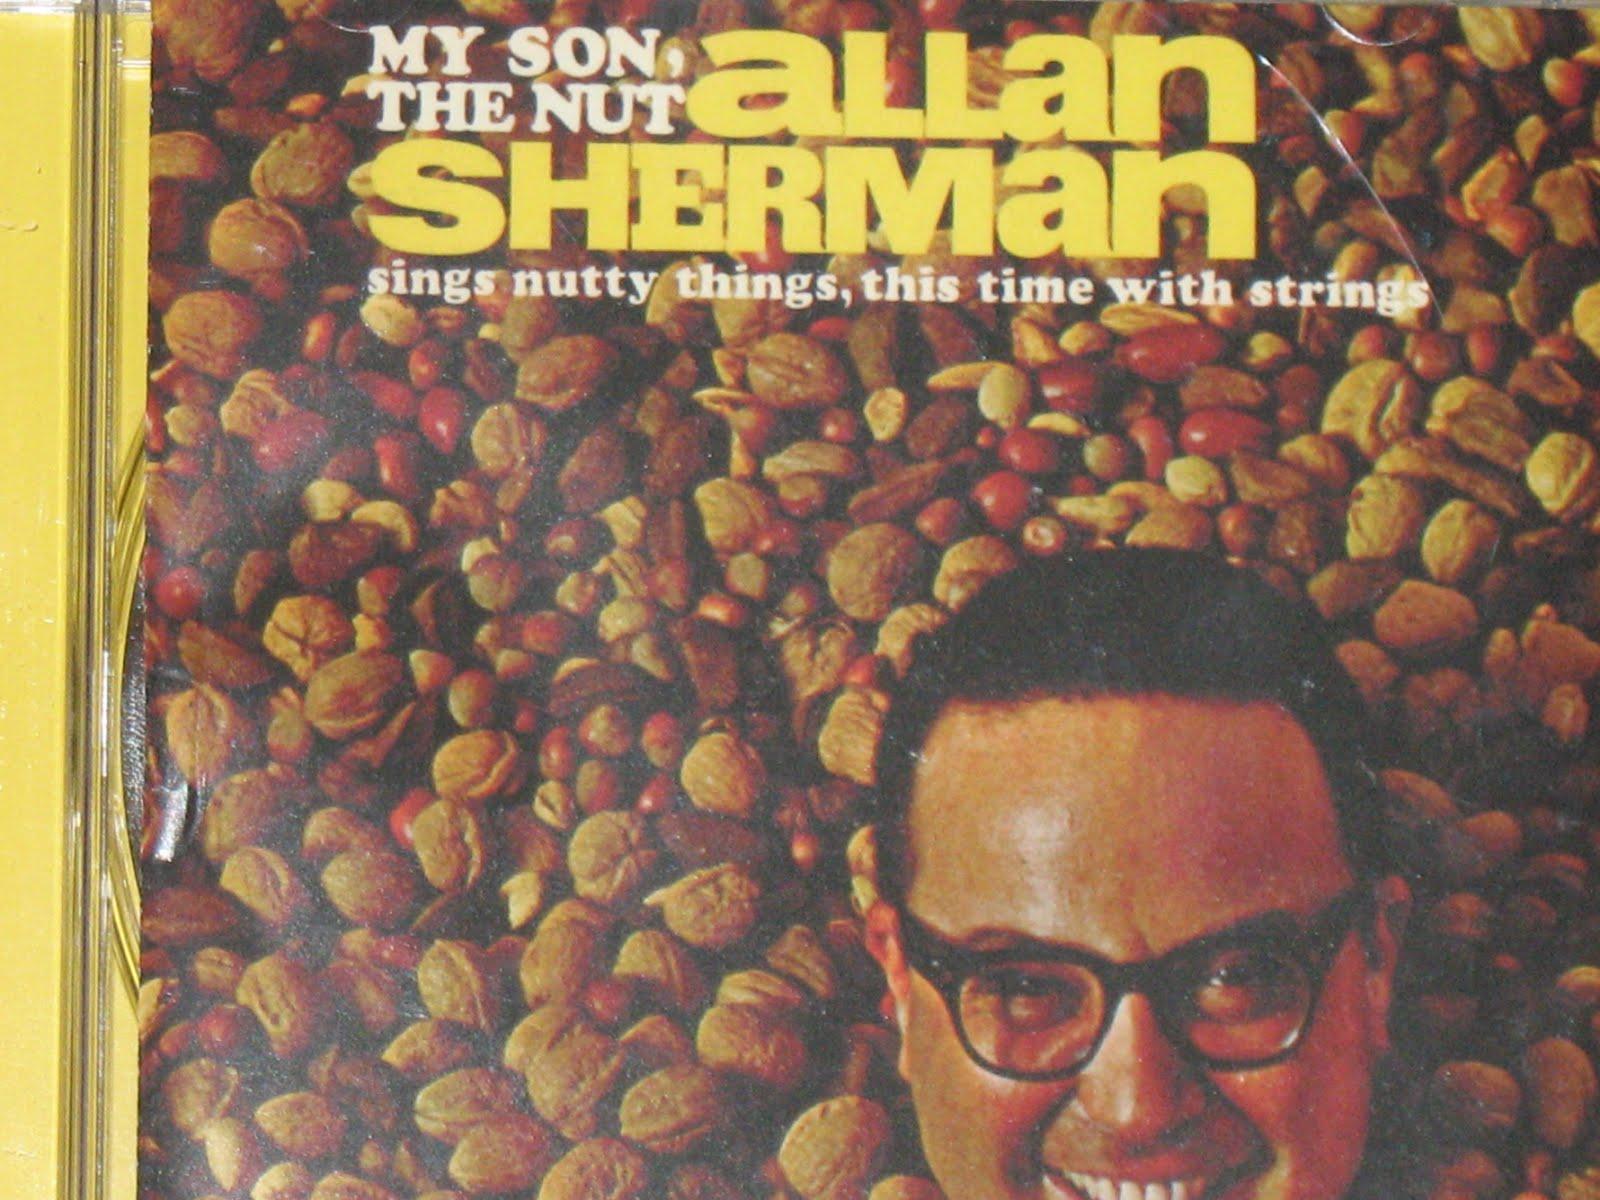 Allan Sherman - My Son, The Celebrity (Full Album ...